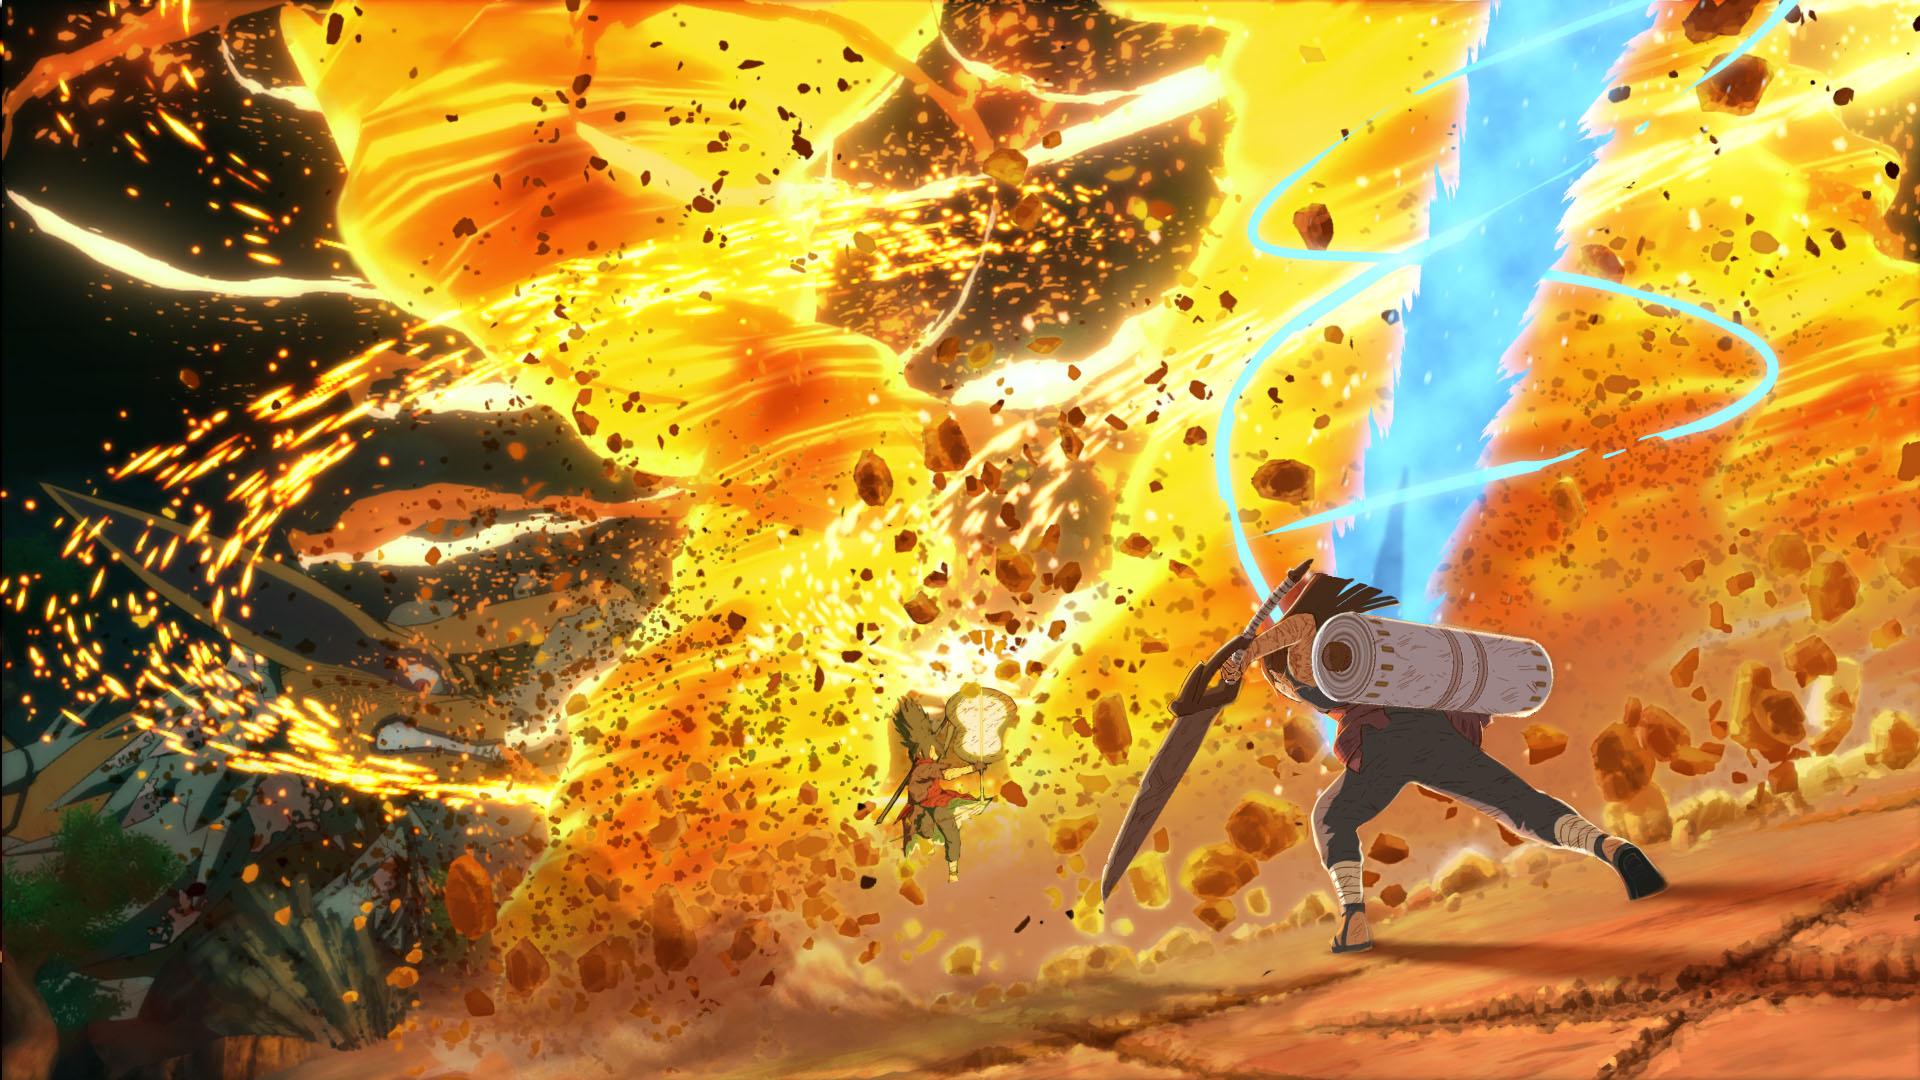 Naruto Shippuden: Ultimate Ninja Storm 4 fire fight screenshot